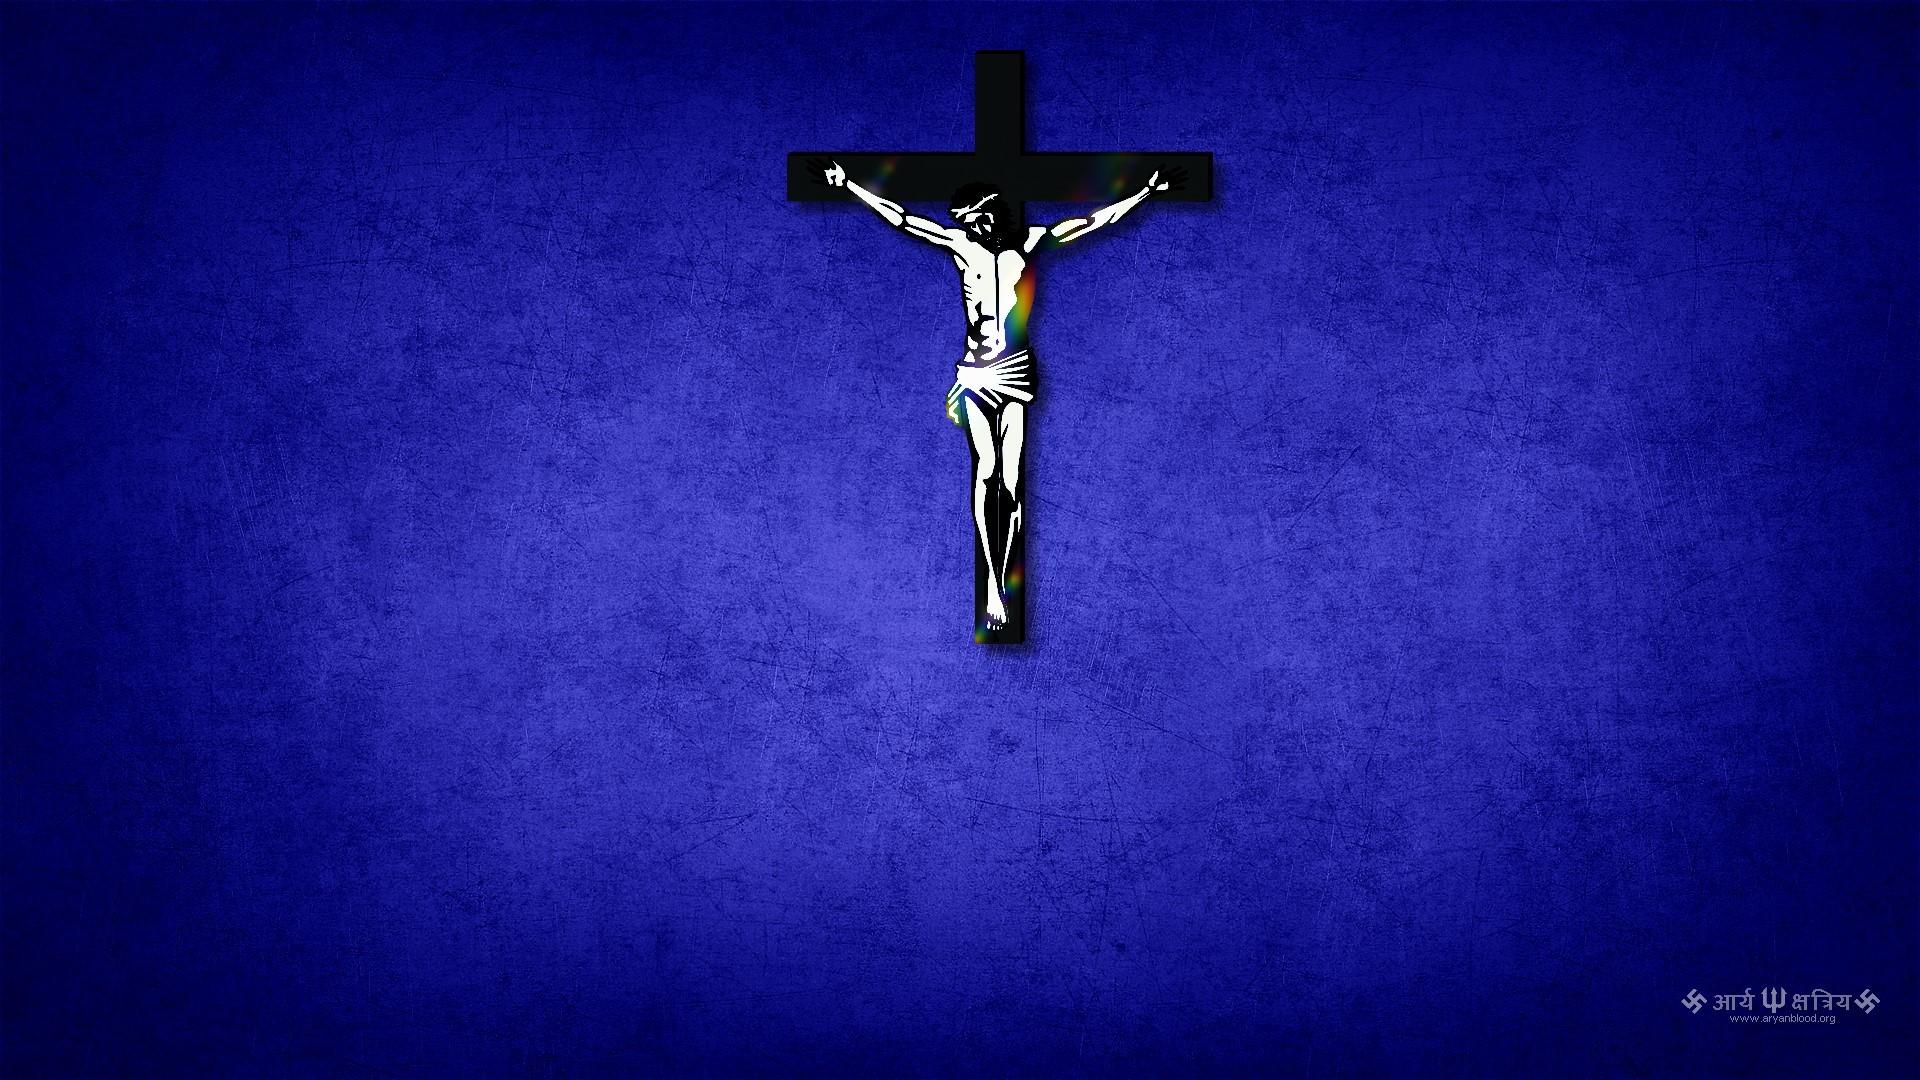 Jesus on the cross Wallpaper 316 1920x1080